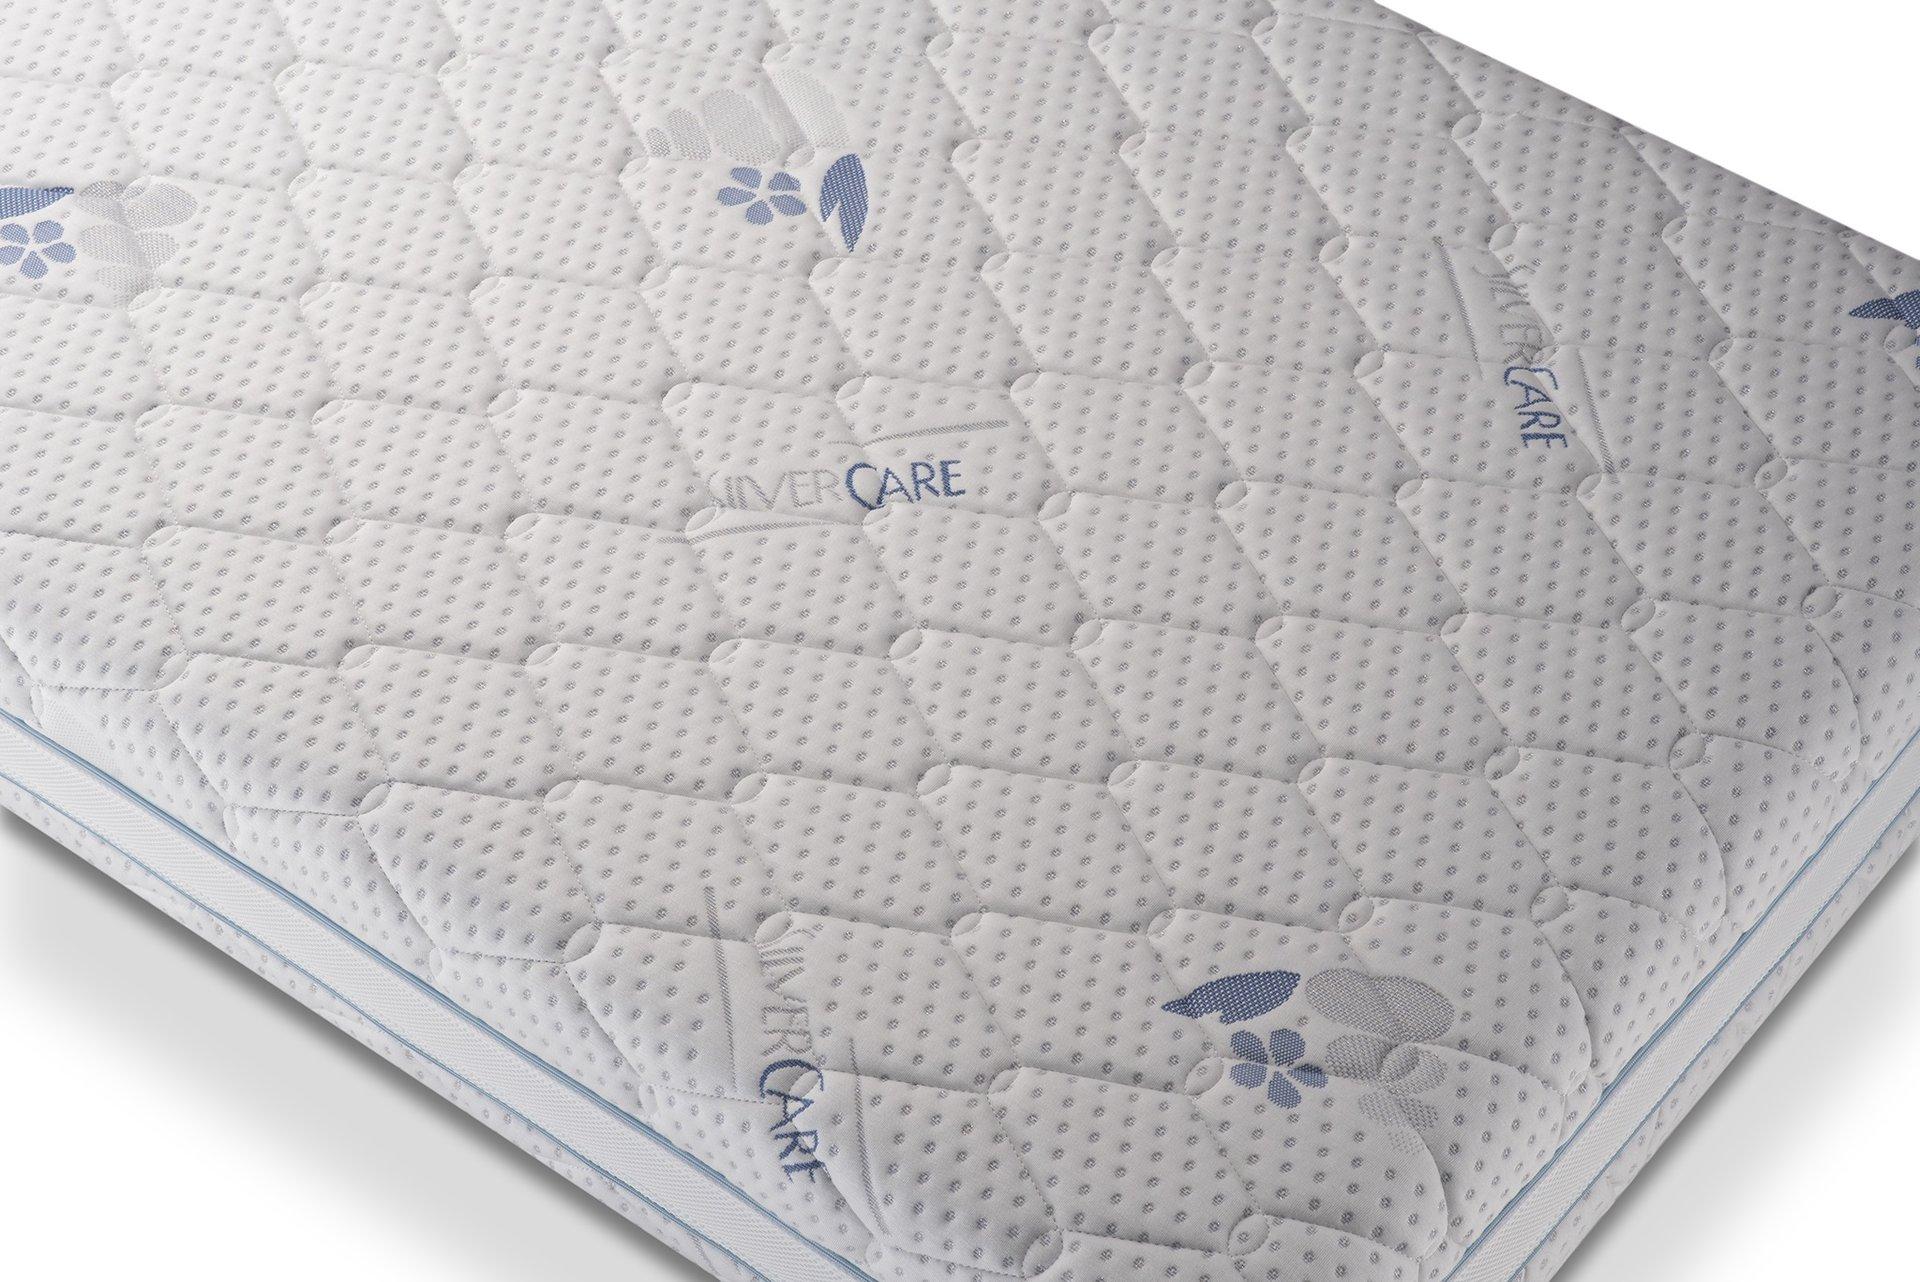 iSilver 22 см, луксозен двулицев матрак